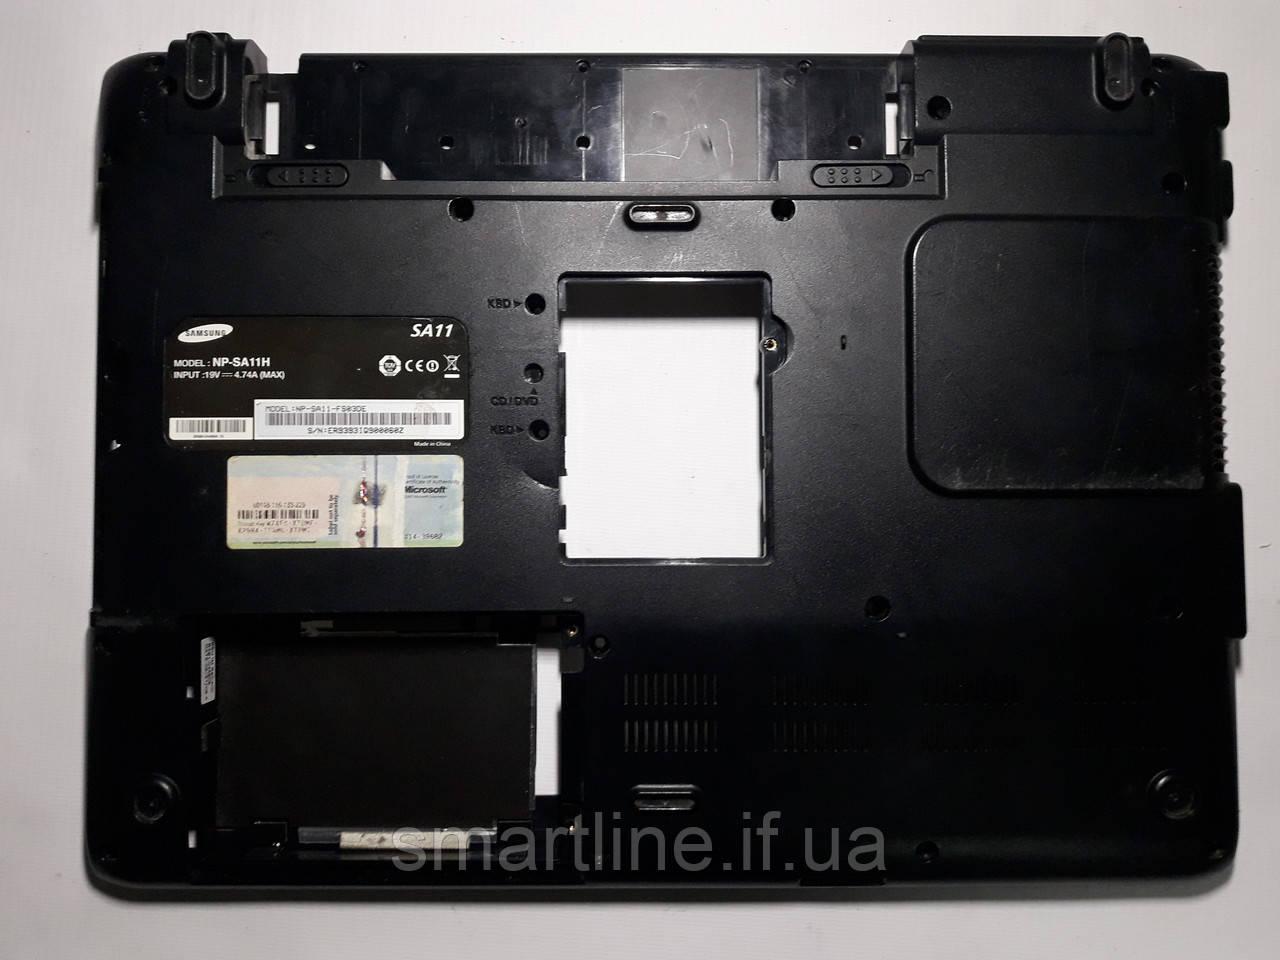 Нижня частина корпусу для ноутбука Samsung NP-SA11H